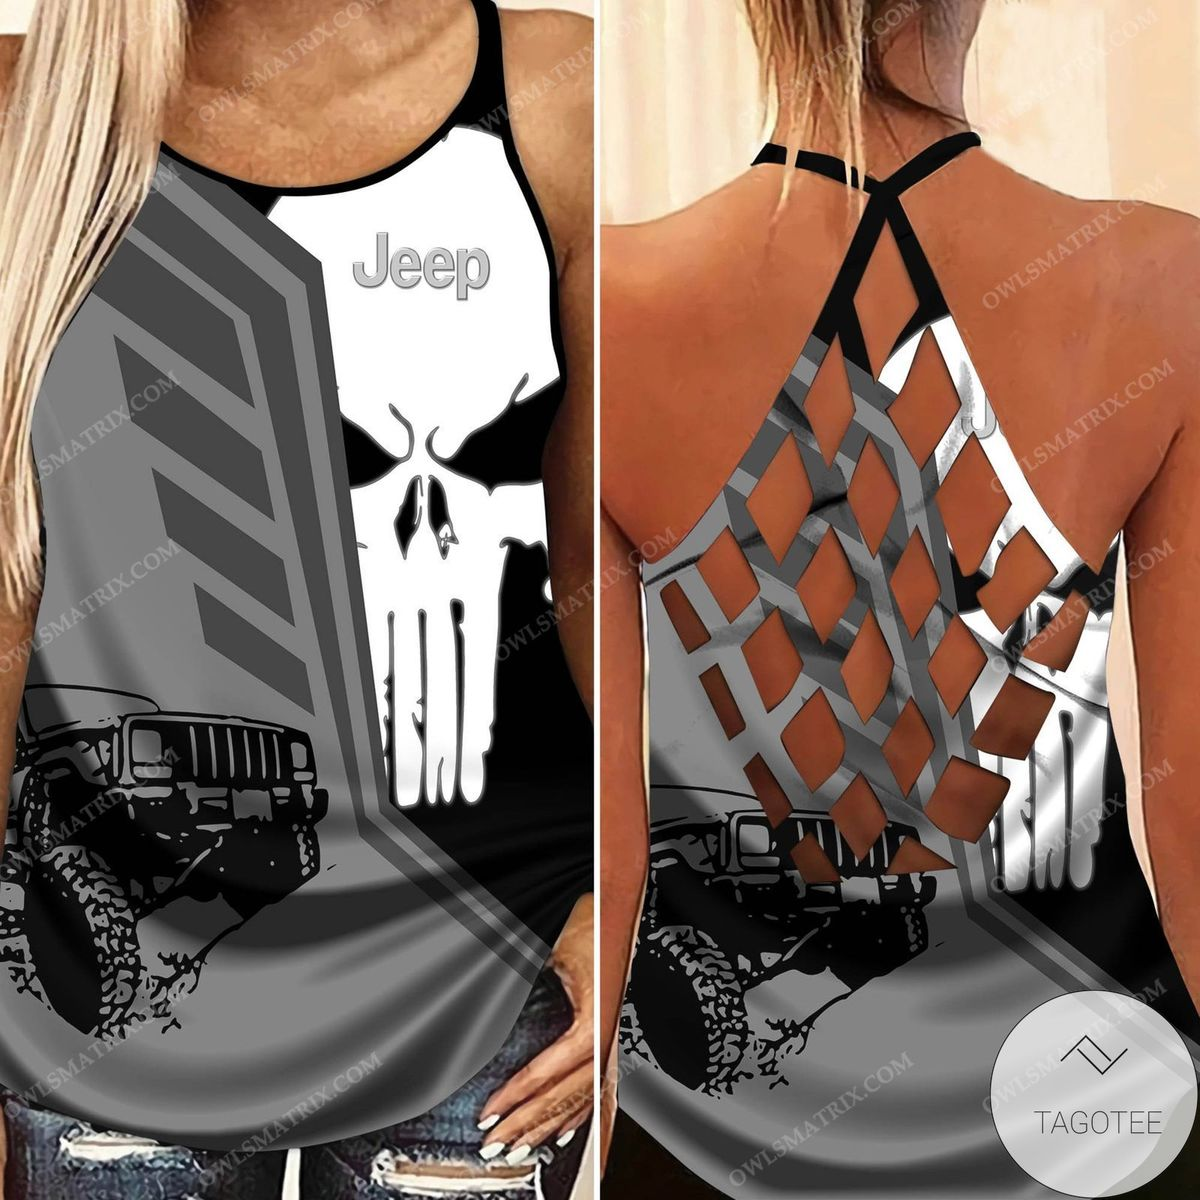 Jeep Girl Skull Criss Cross Tank Top